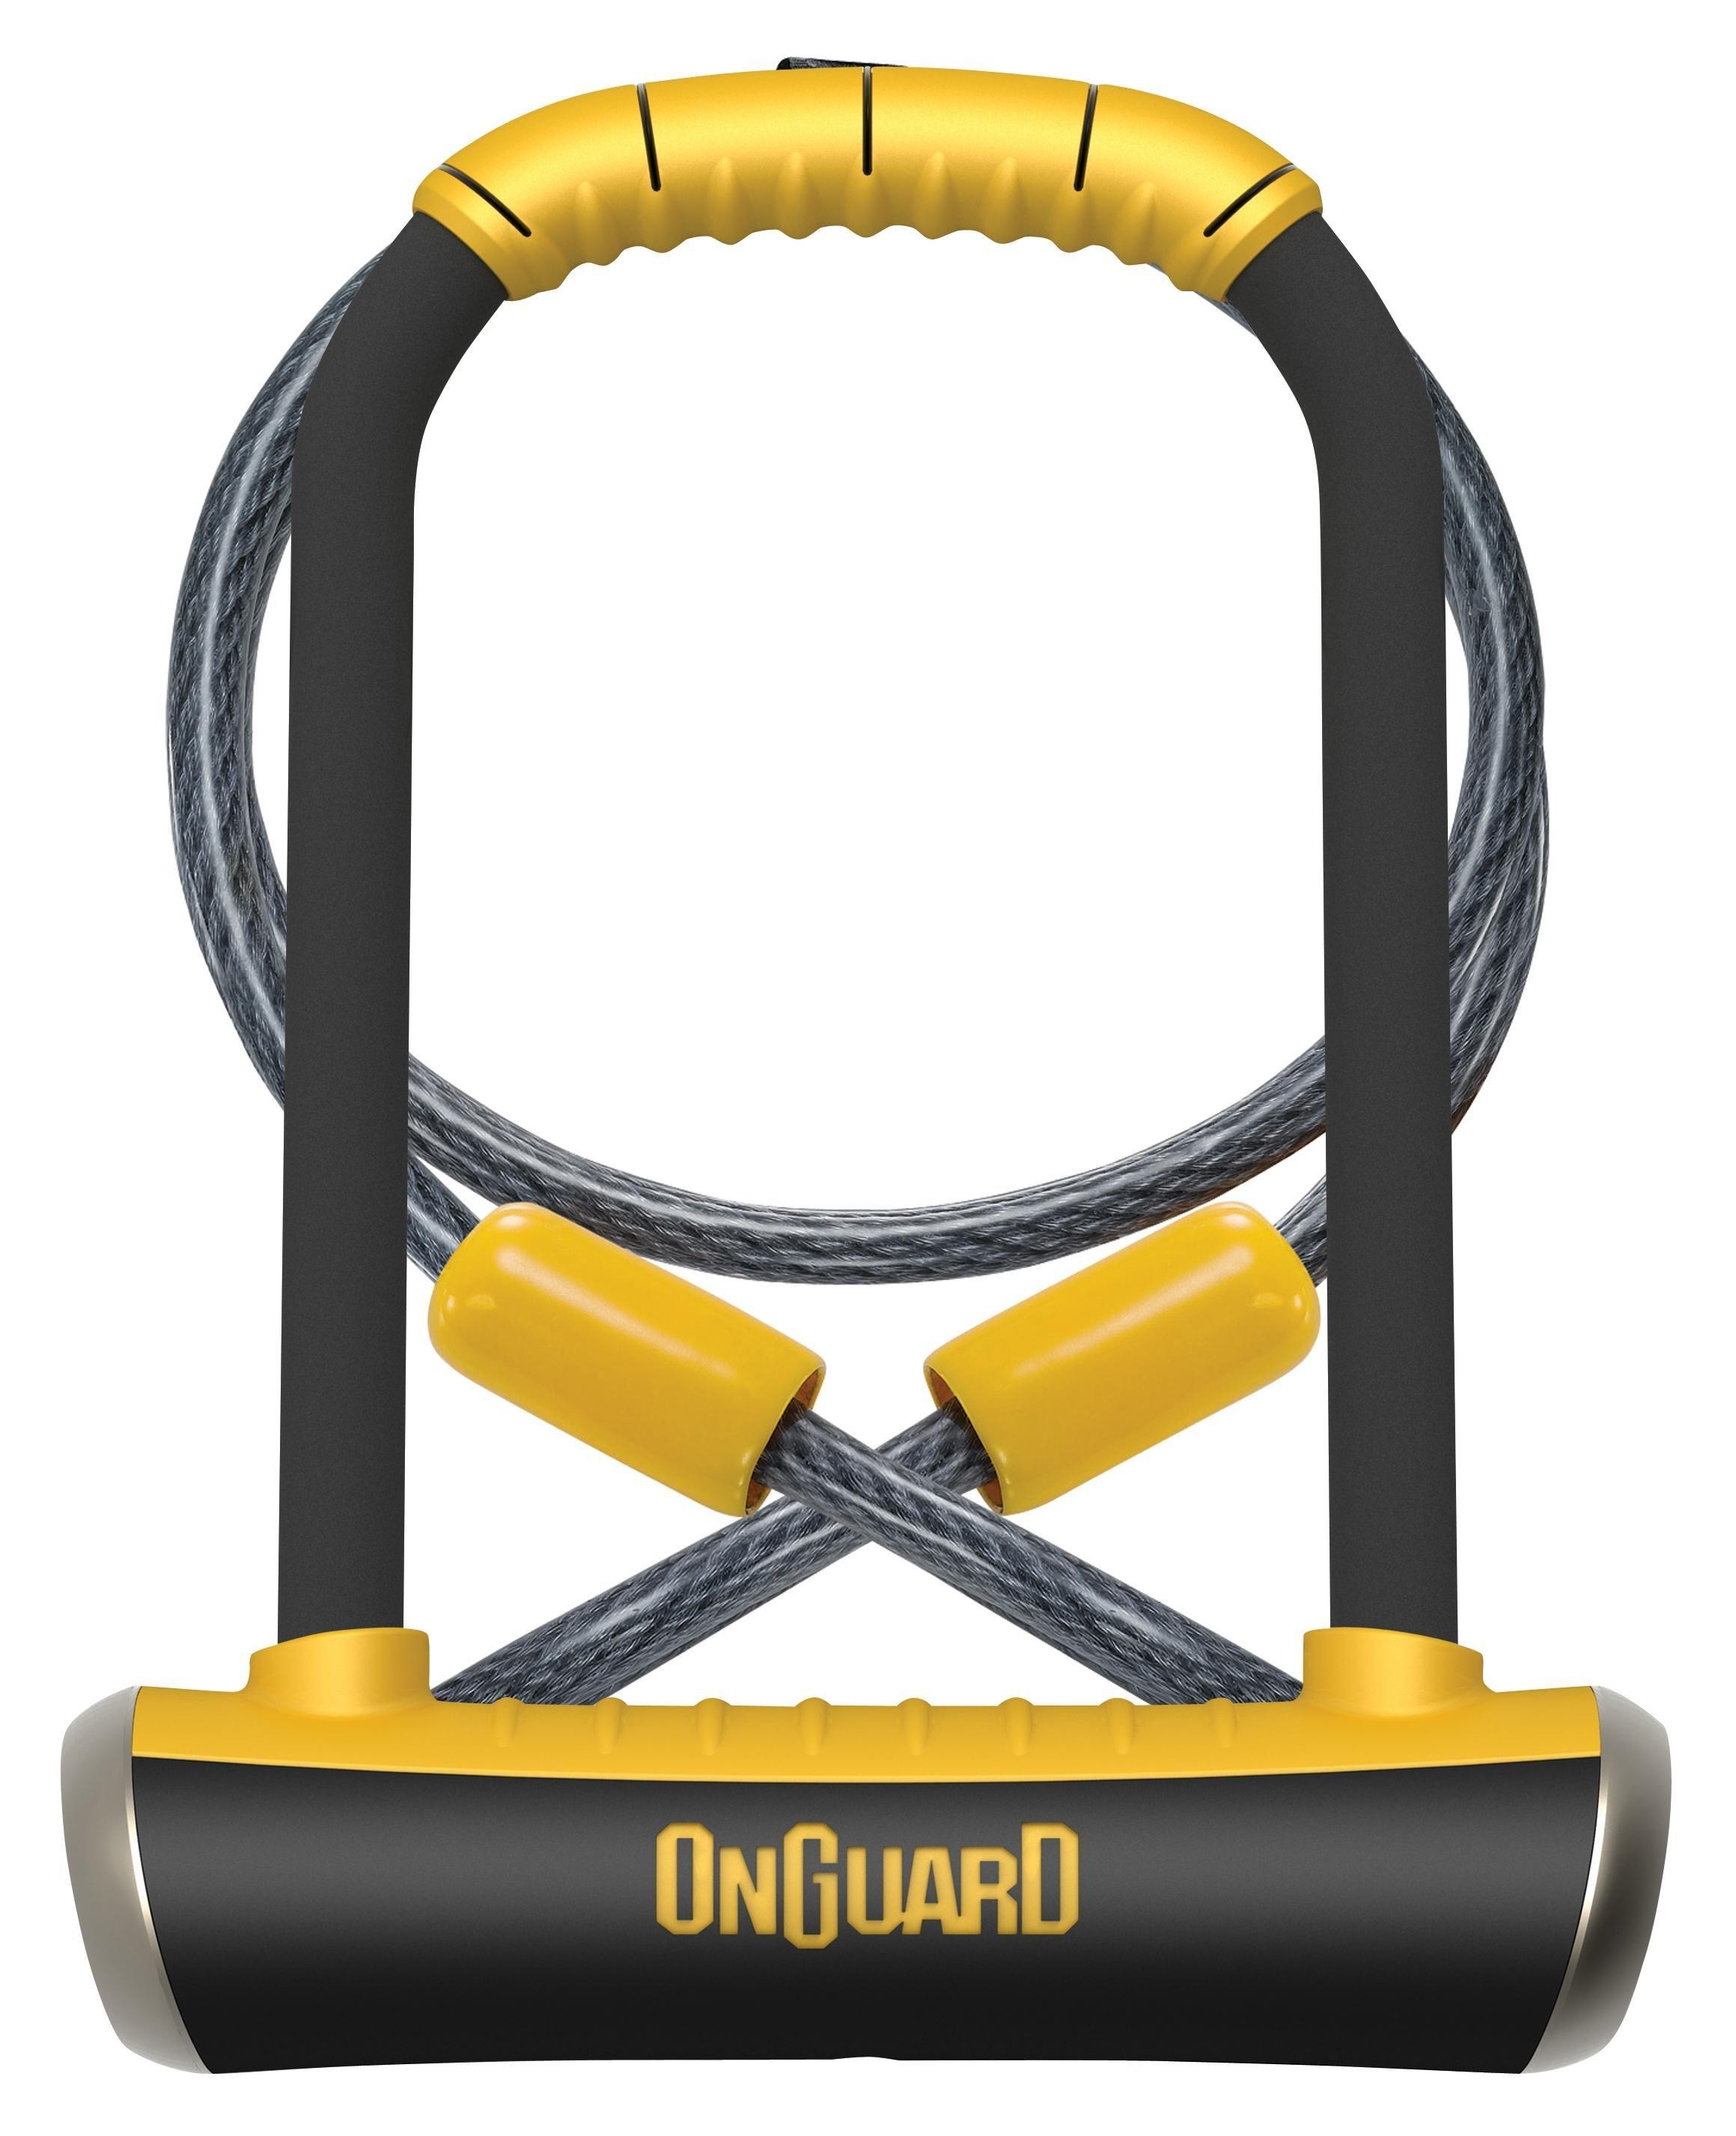 on guard 8005 pitbull keyed shackle lock 11 5 x 23 0 cm black. Black Bedroom Furniture Sets. Home Design Ideas